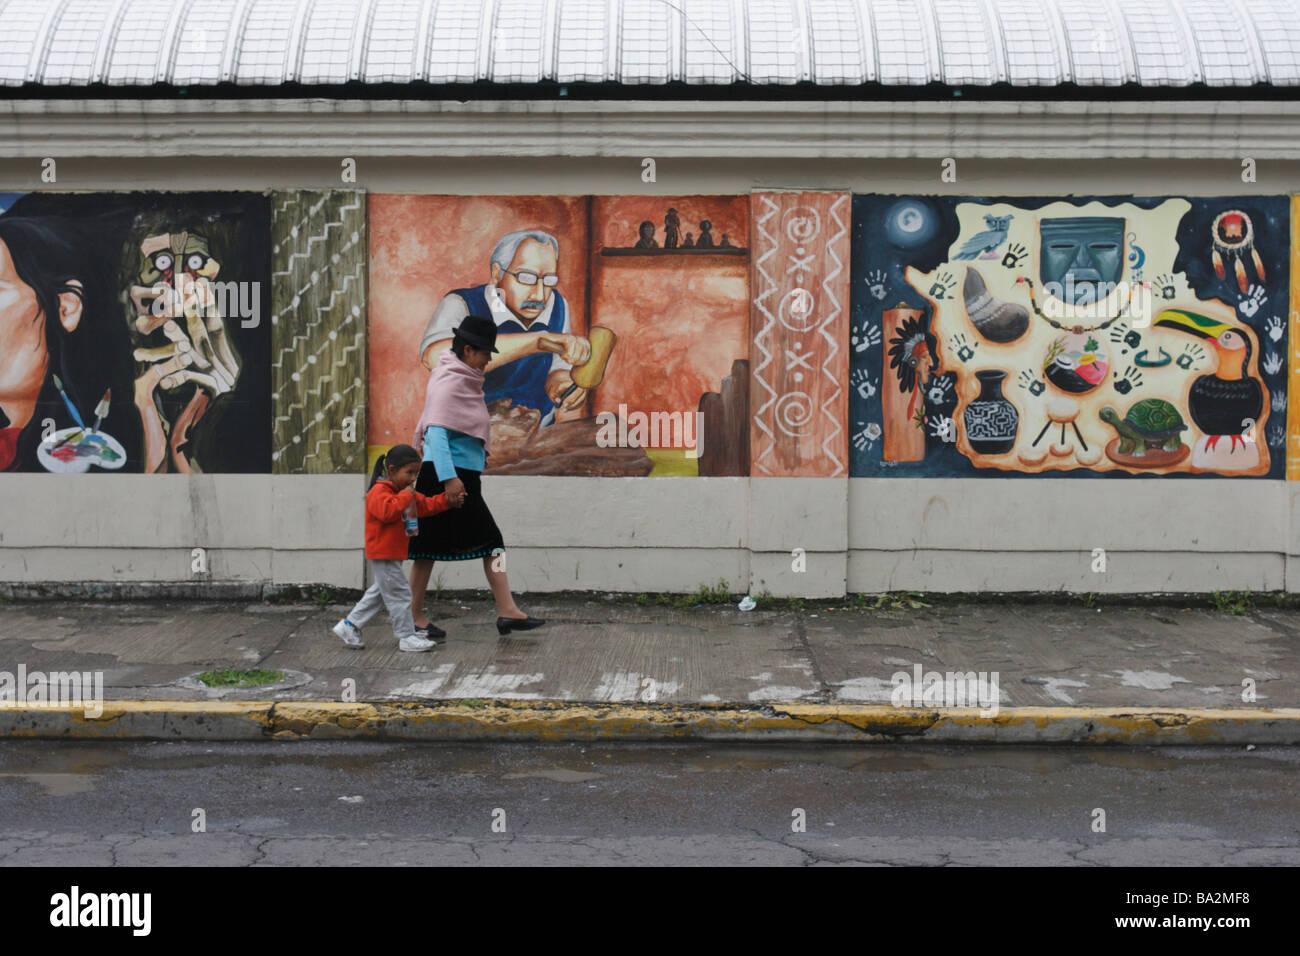 Mercado Artesanal La Mariscal, Quito New City, Ecuador. - Stock Image